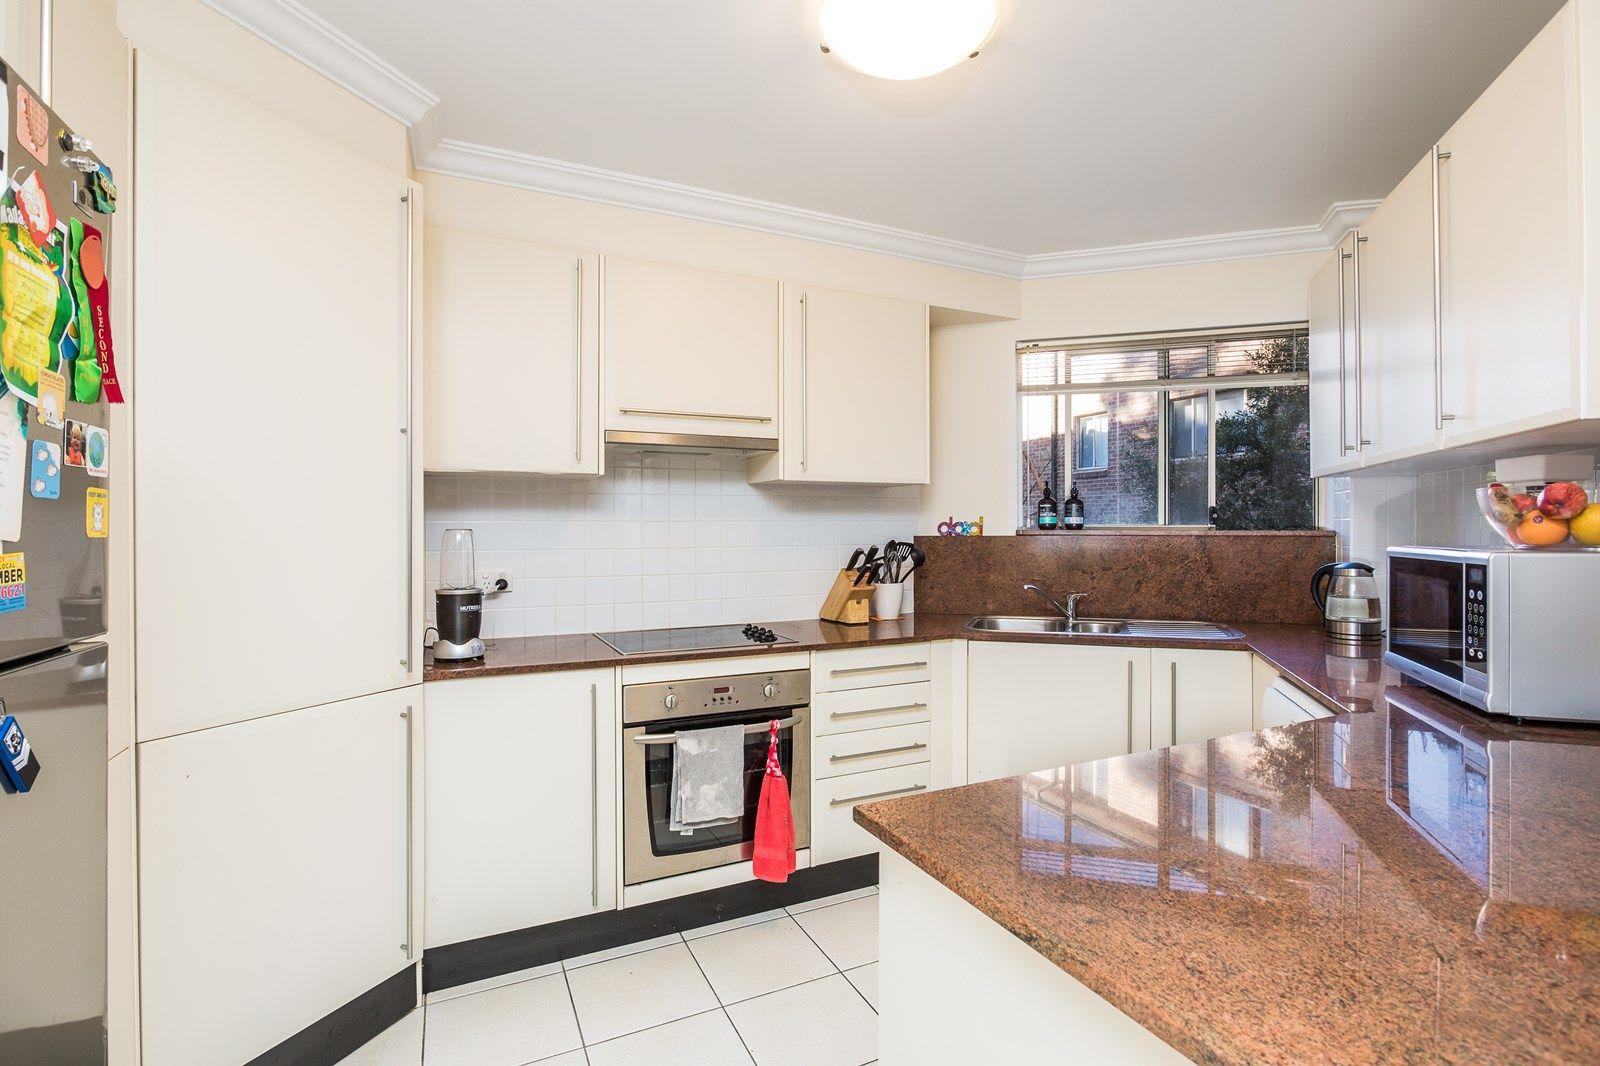 3/239 Kingsway, Caringbah NSW 2229, Image 2